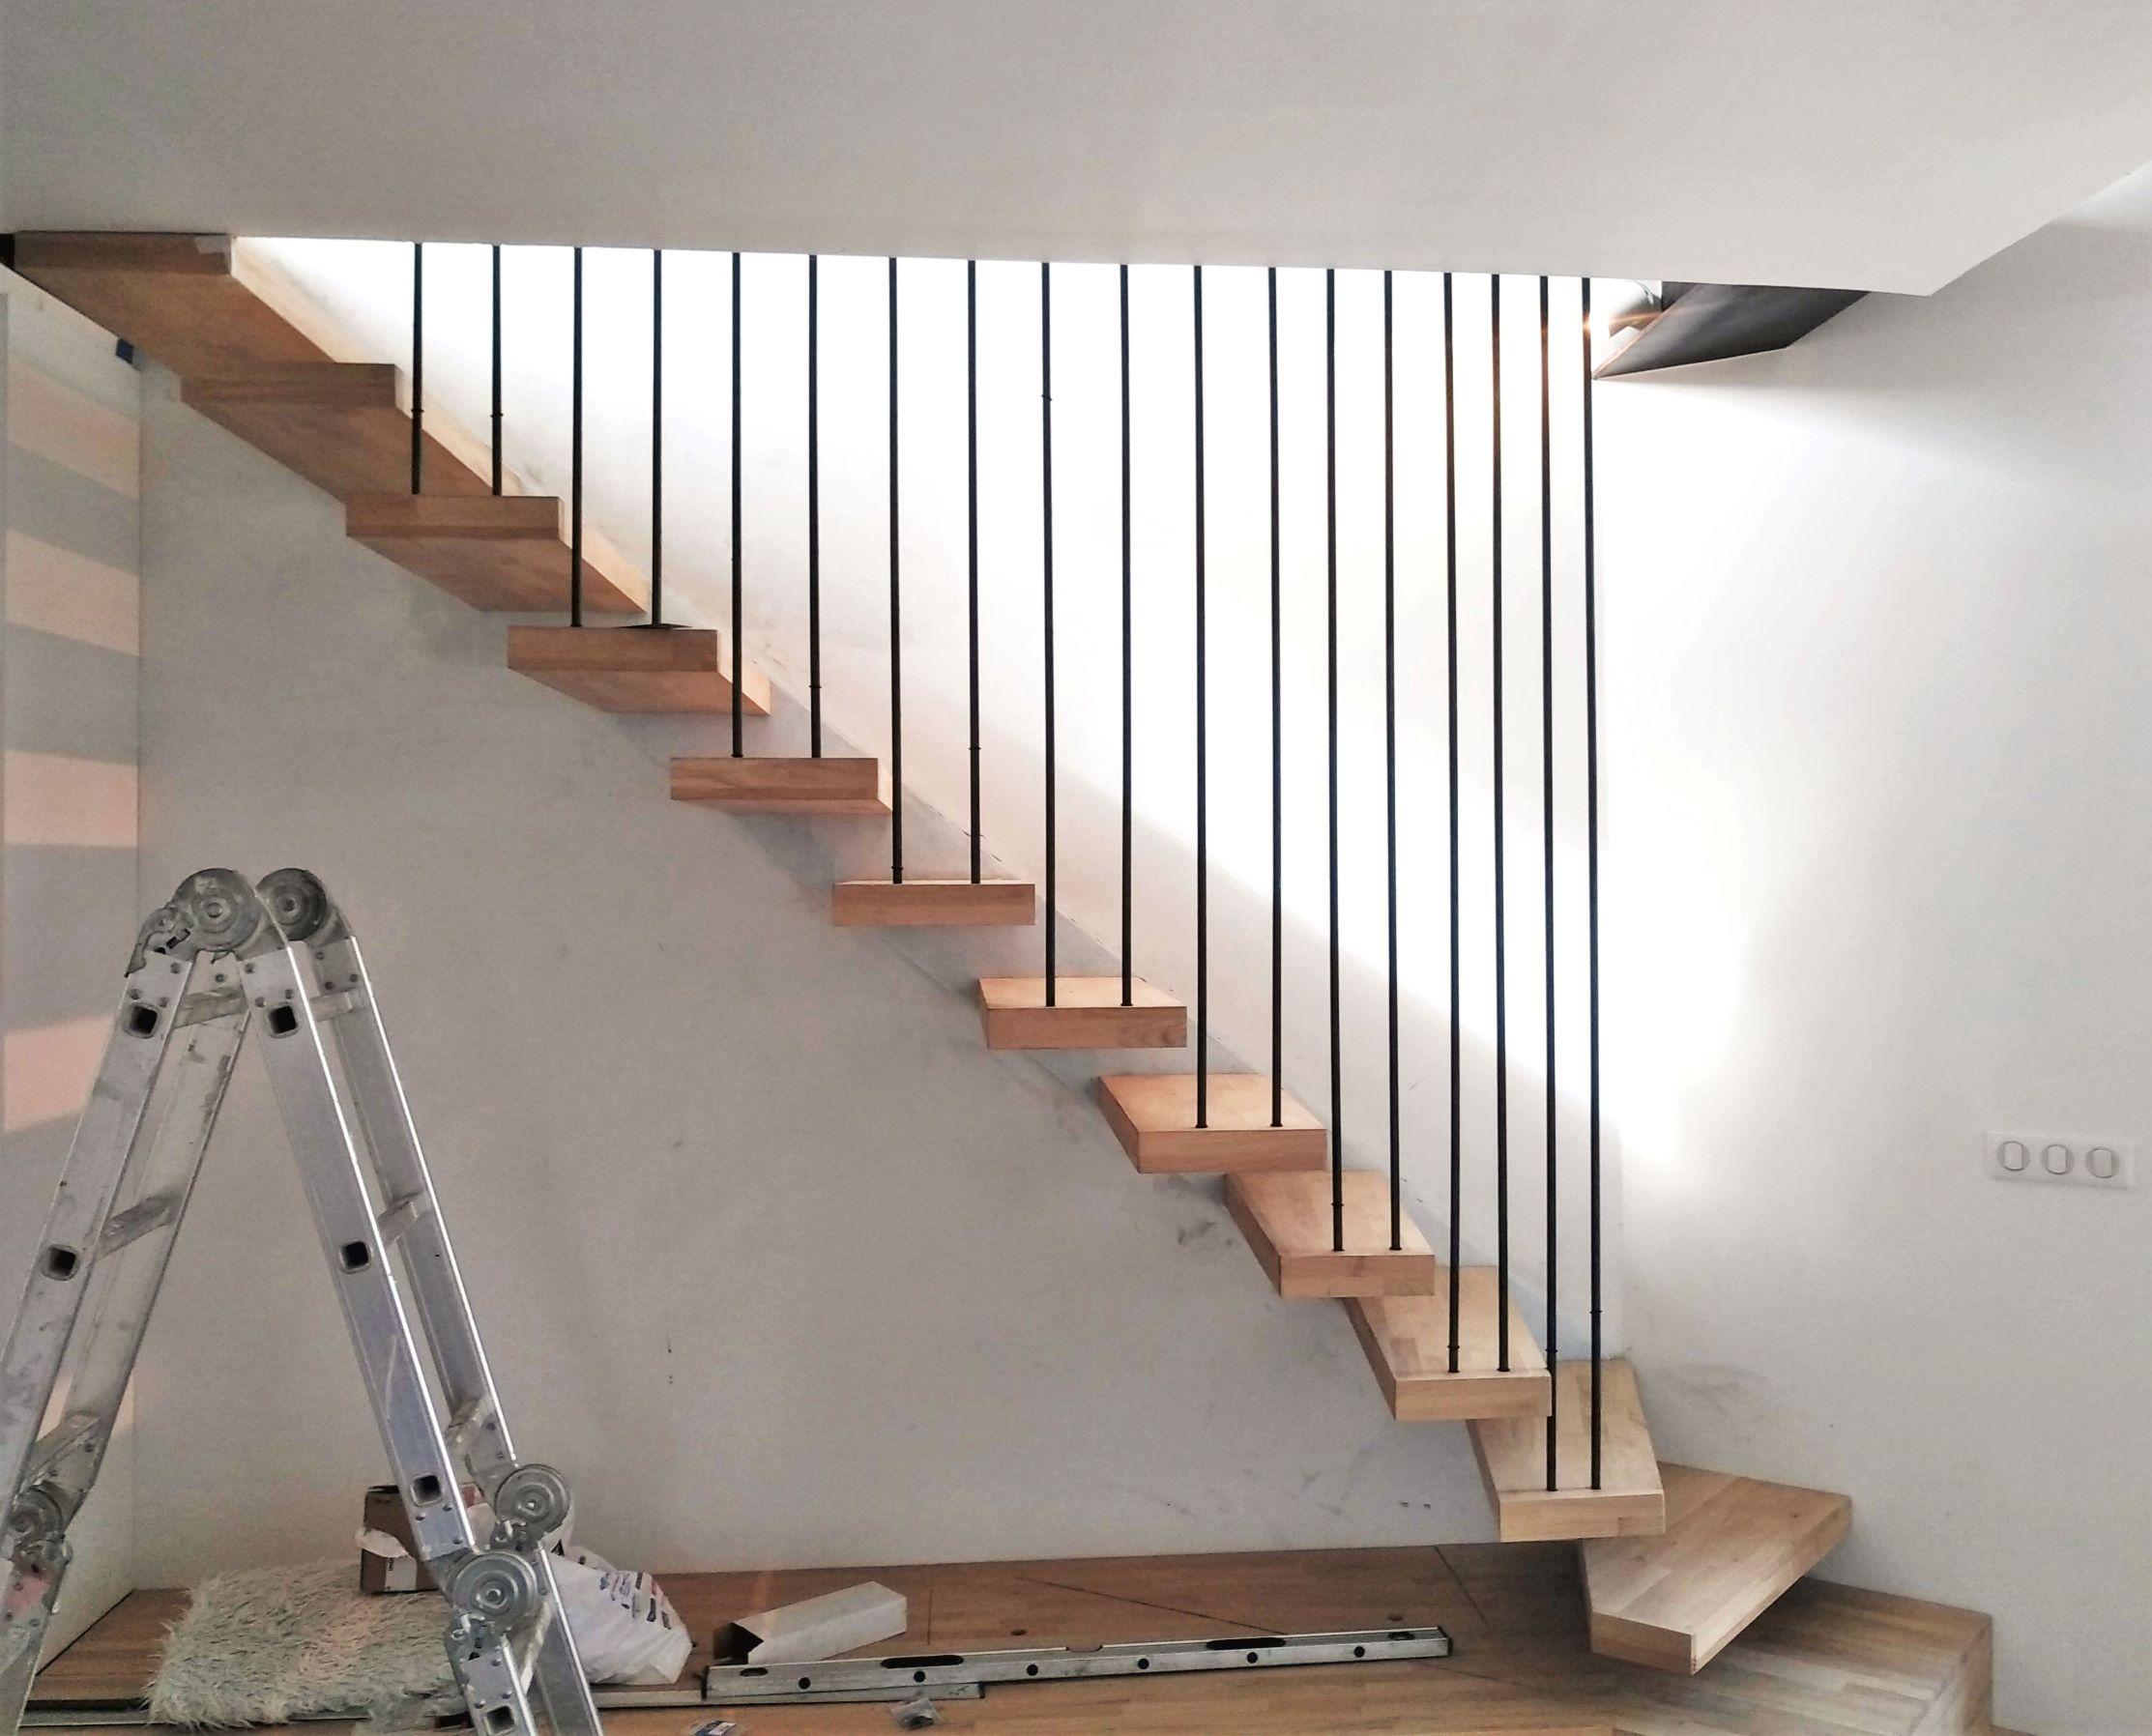 Inox-Ngo-ferronnier-Marseille-escalier-flottant-bois-métal-55r